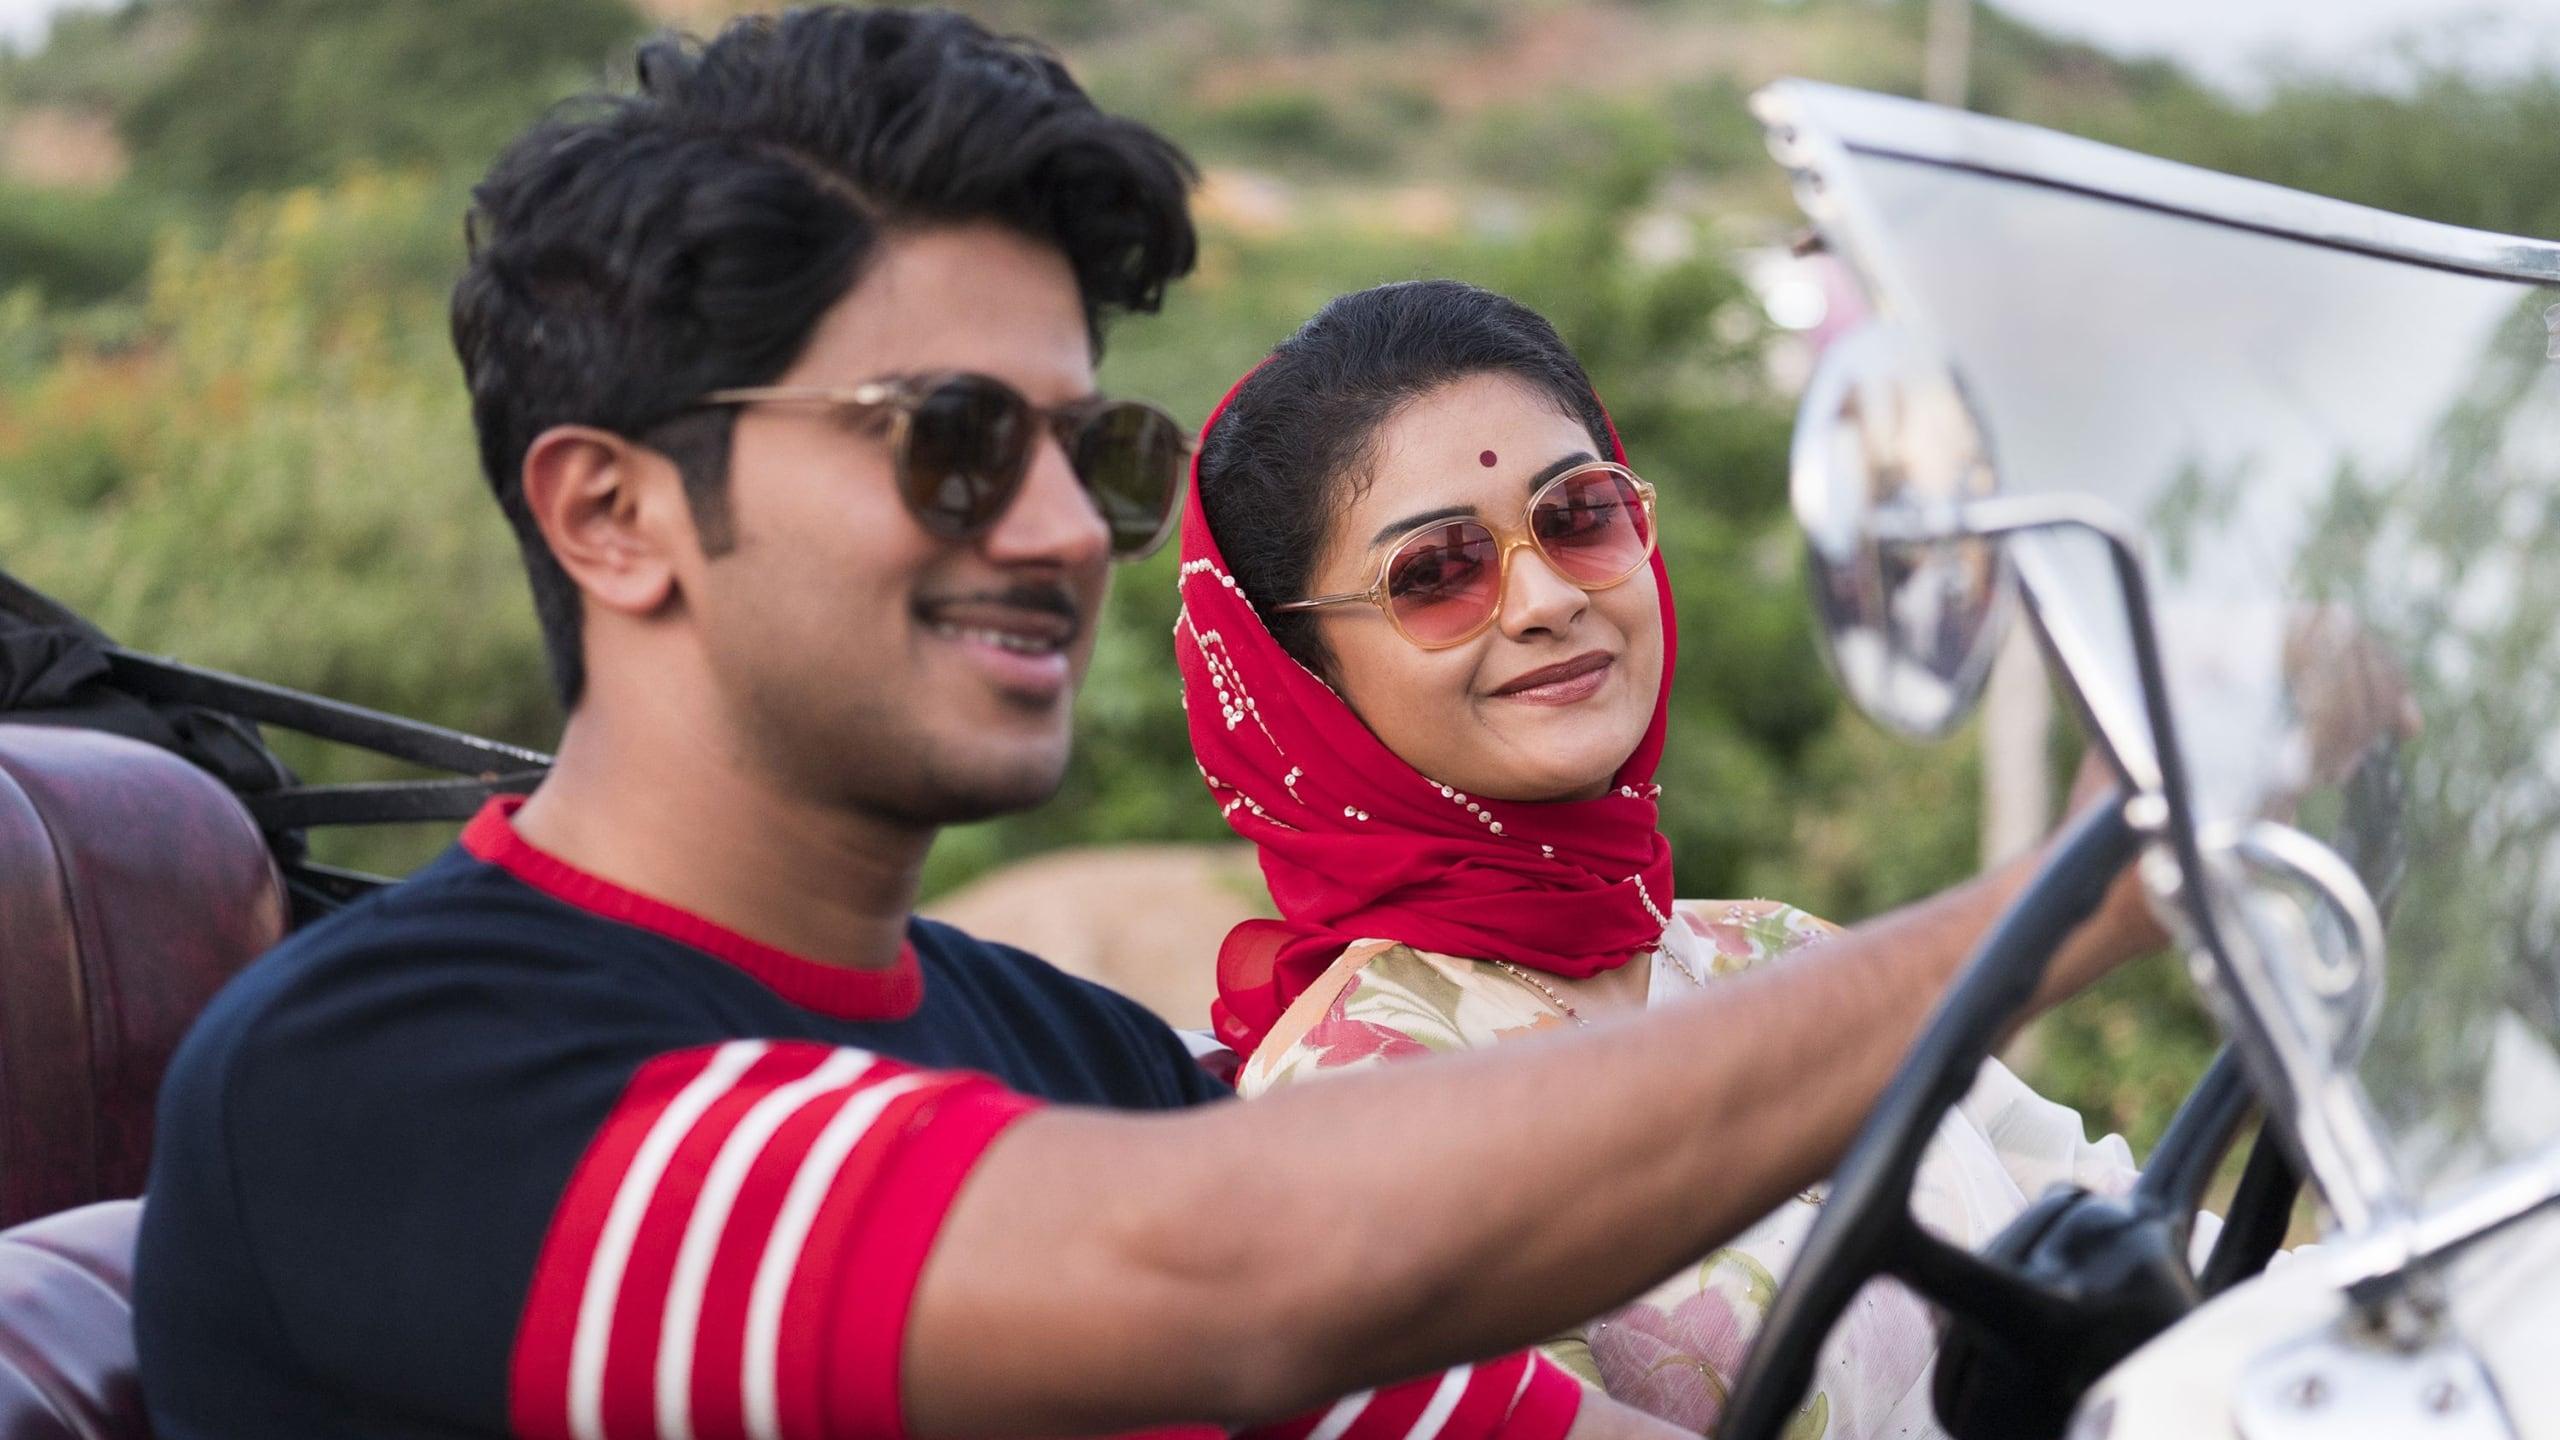 Dulquer Salmaan As Gemini Ganesan First Look From Mahanati: [Download]^ Mahanati Full Movie Online Free 123movies